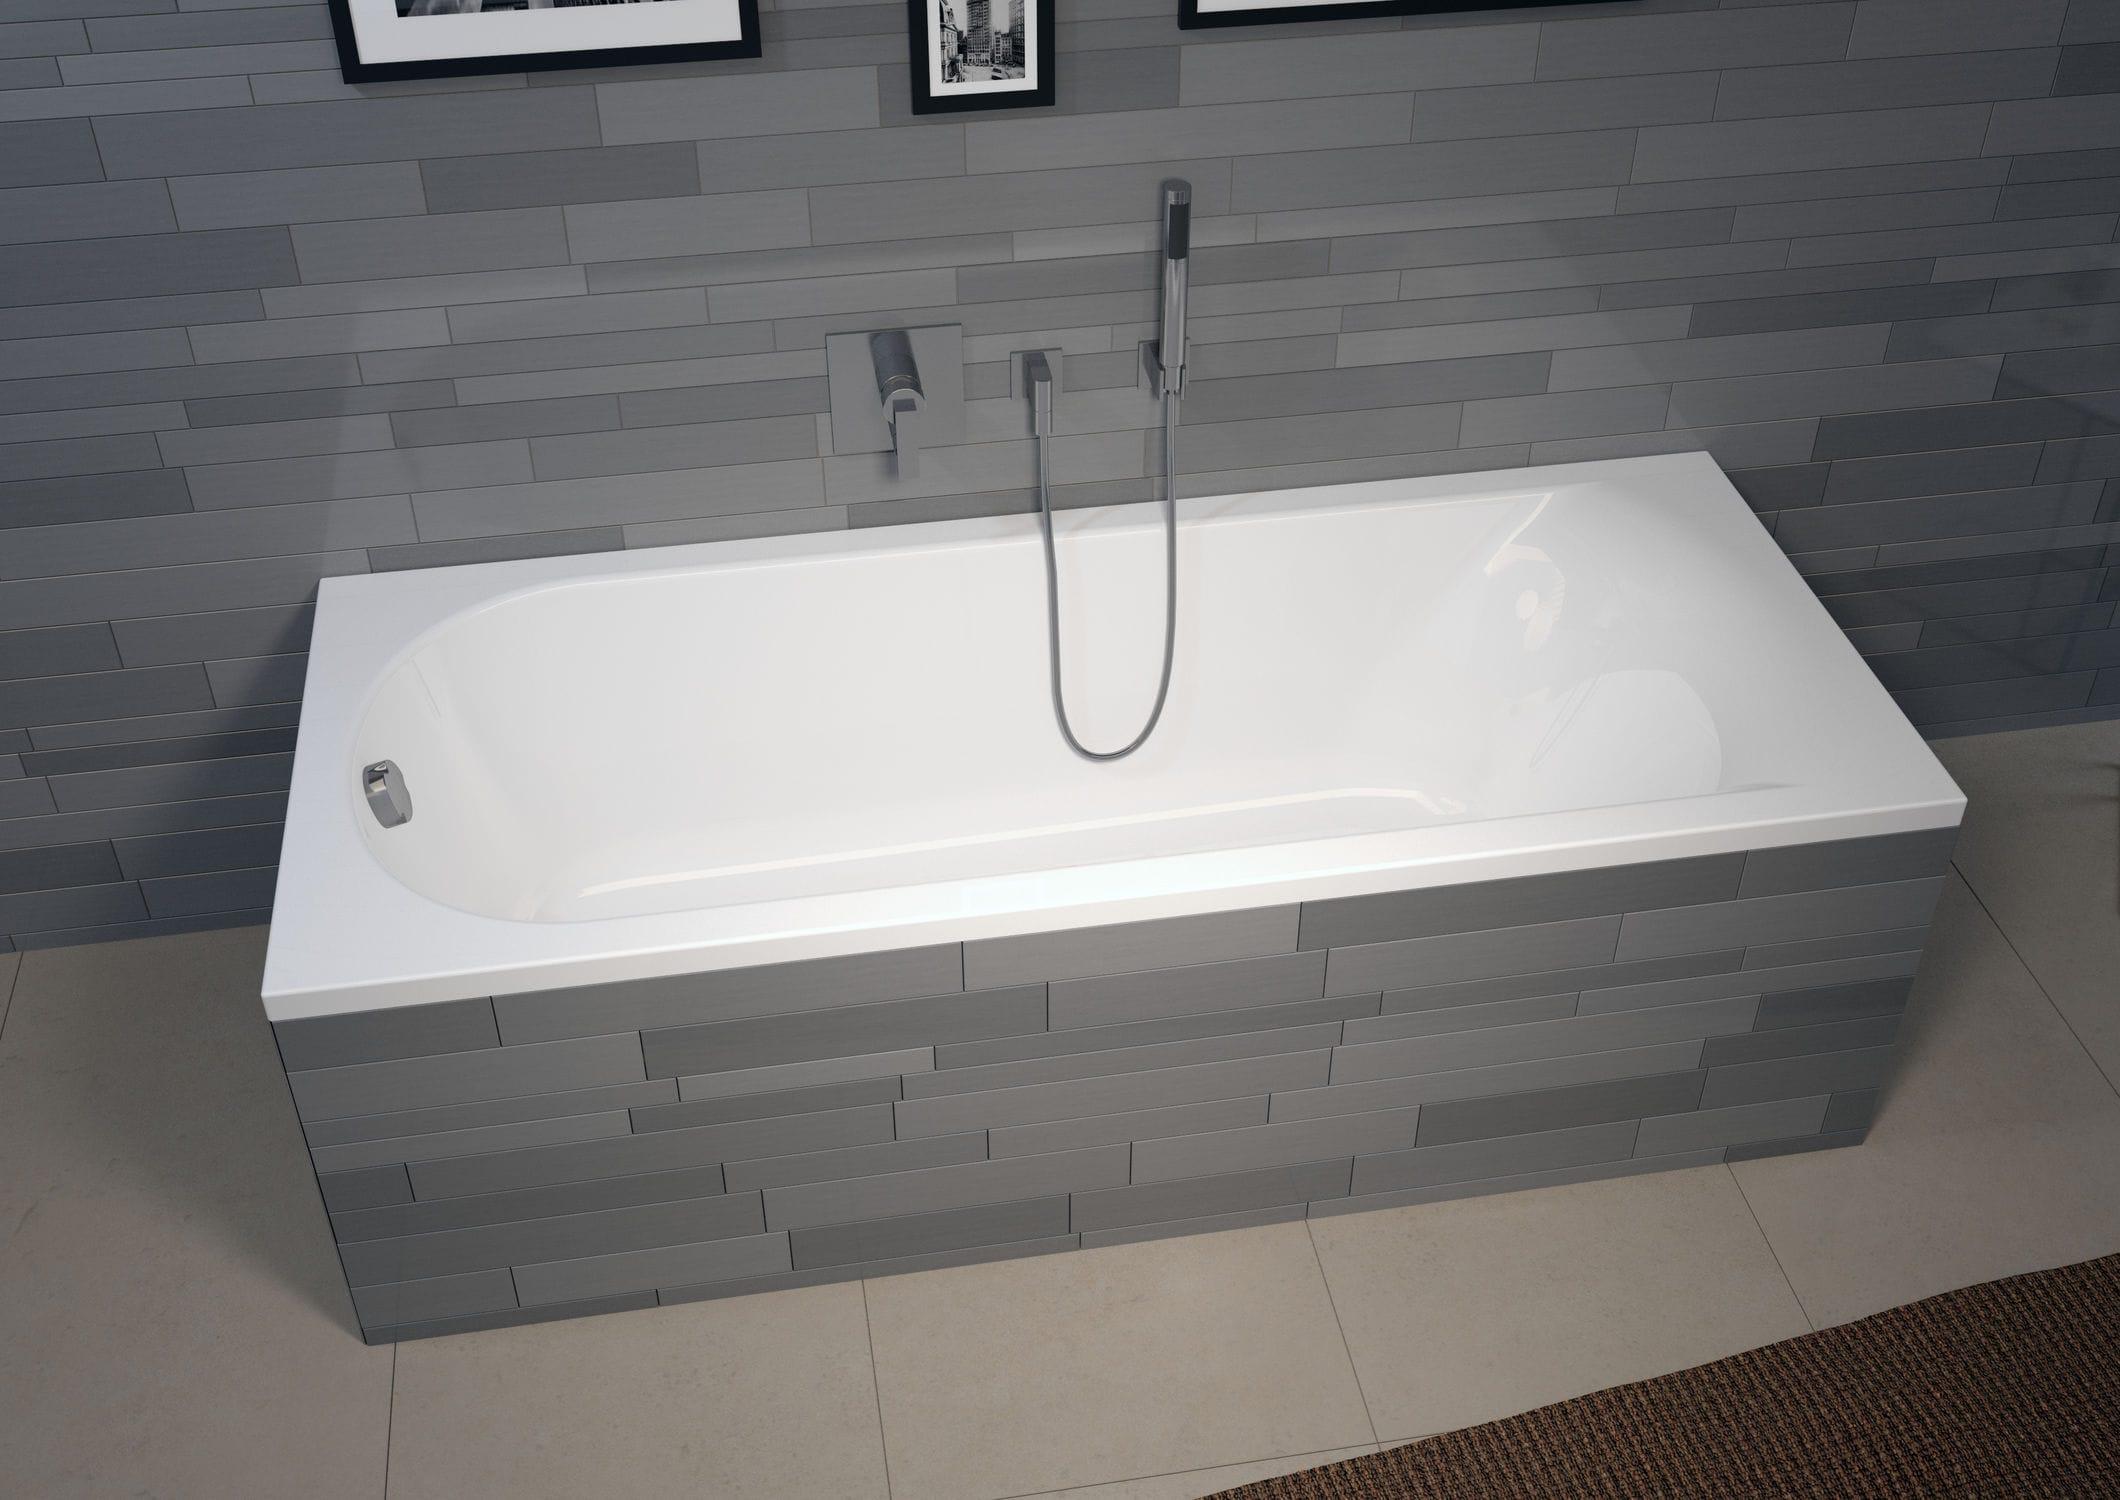 Vasca da bagno in acrilico - MIAMI 150X70 BB58 - RIHO